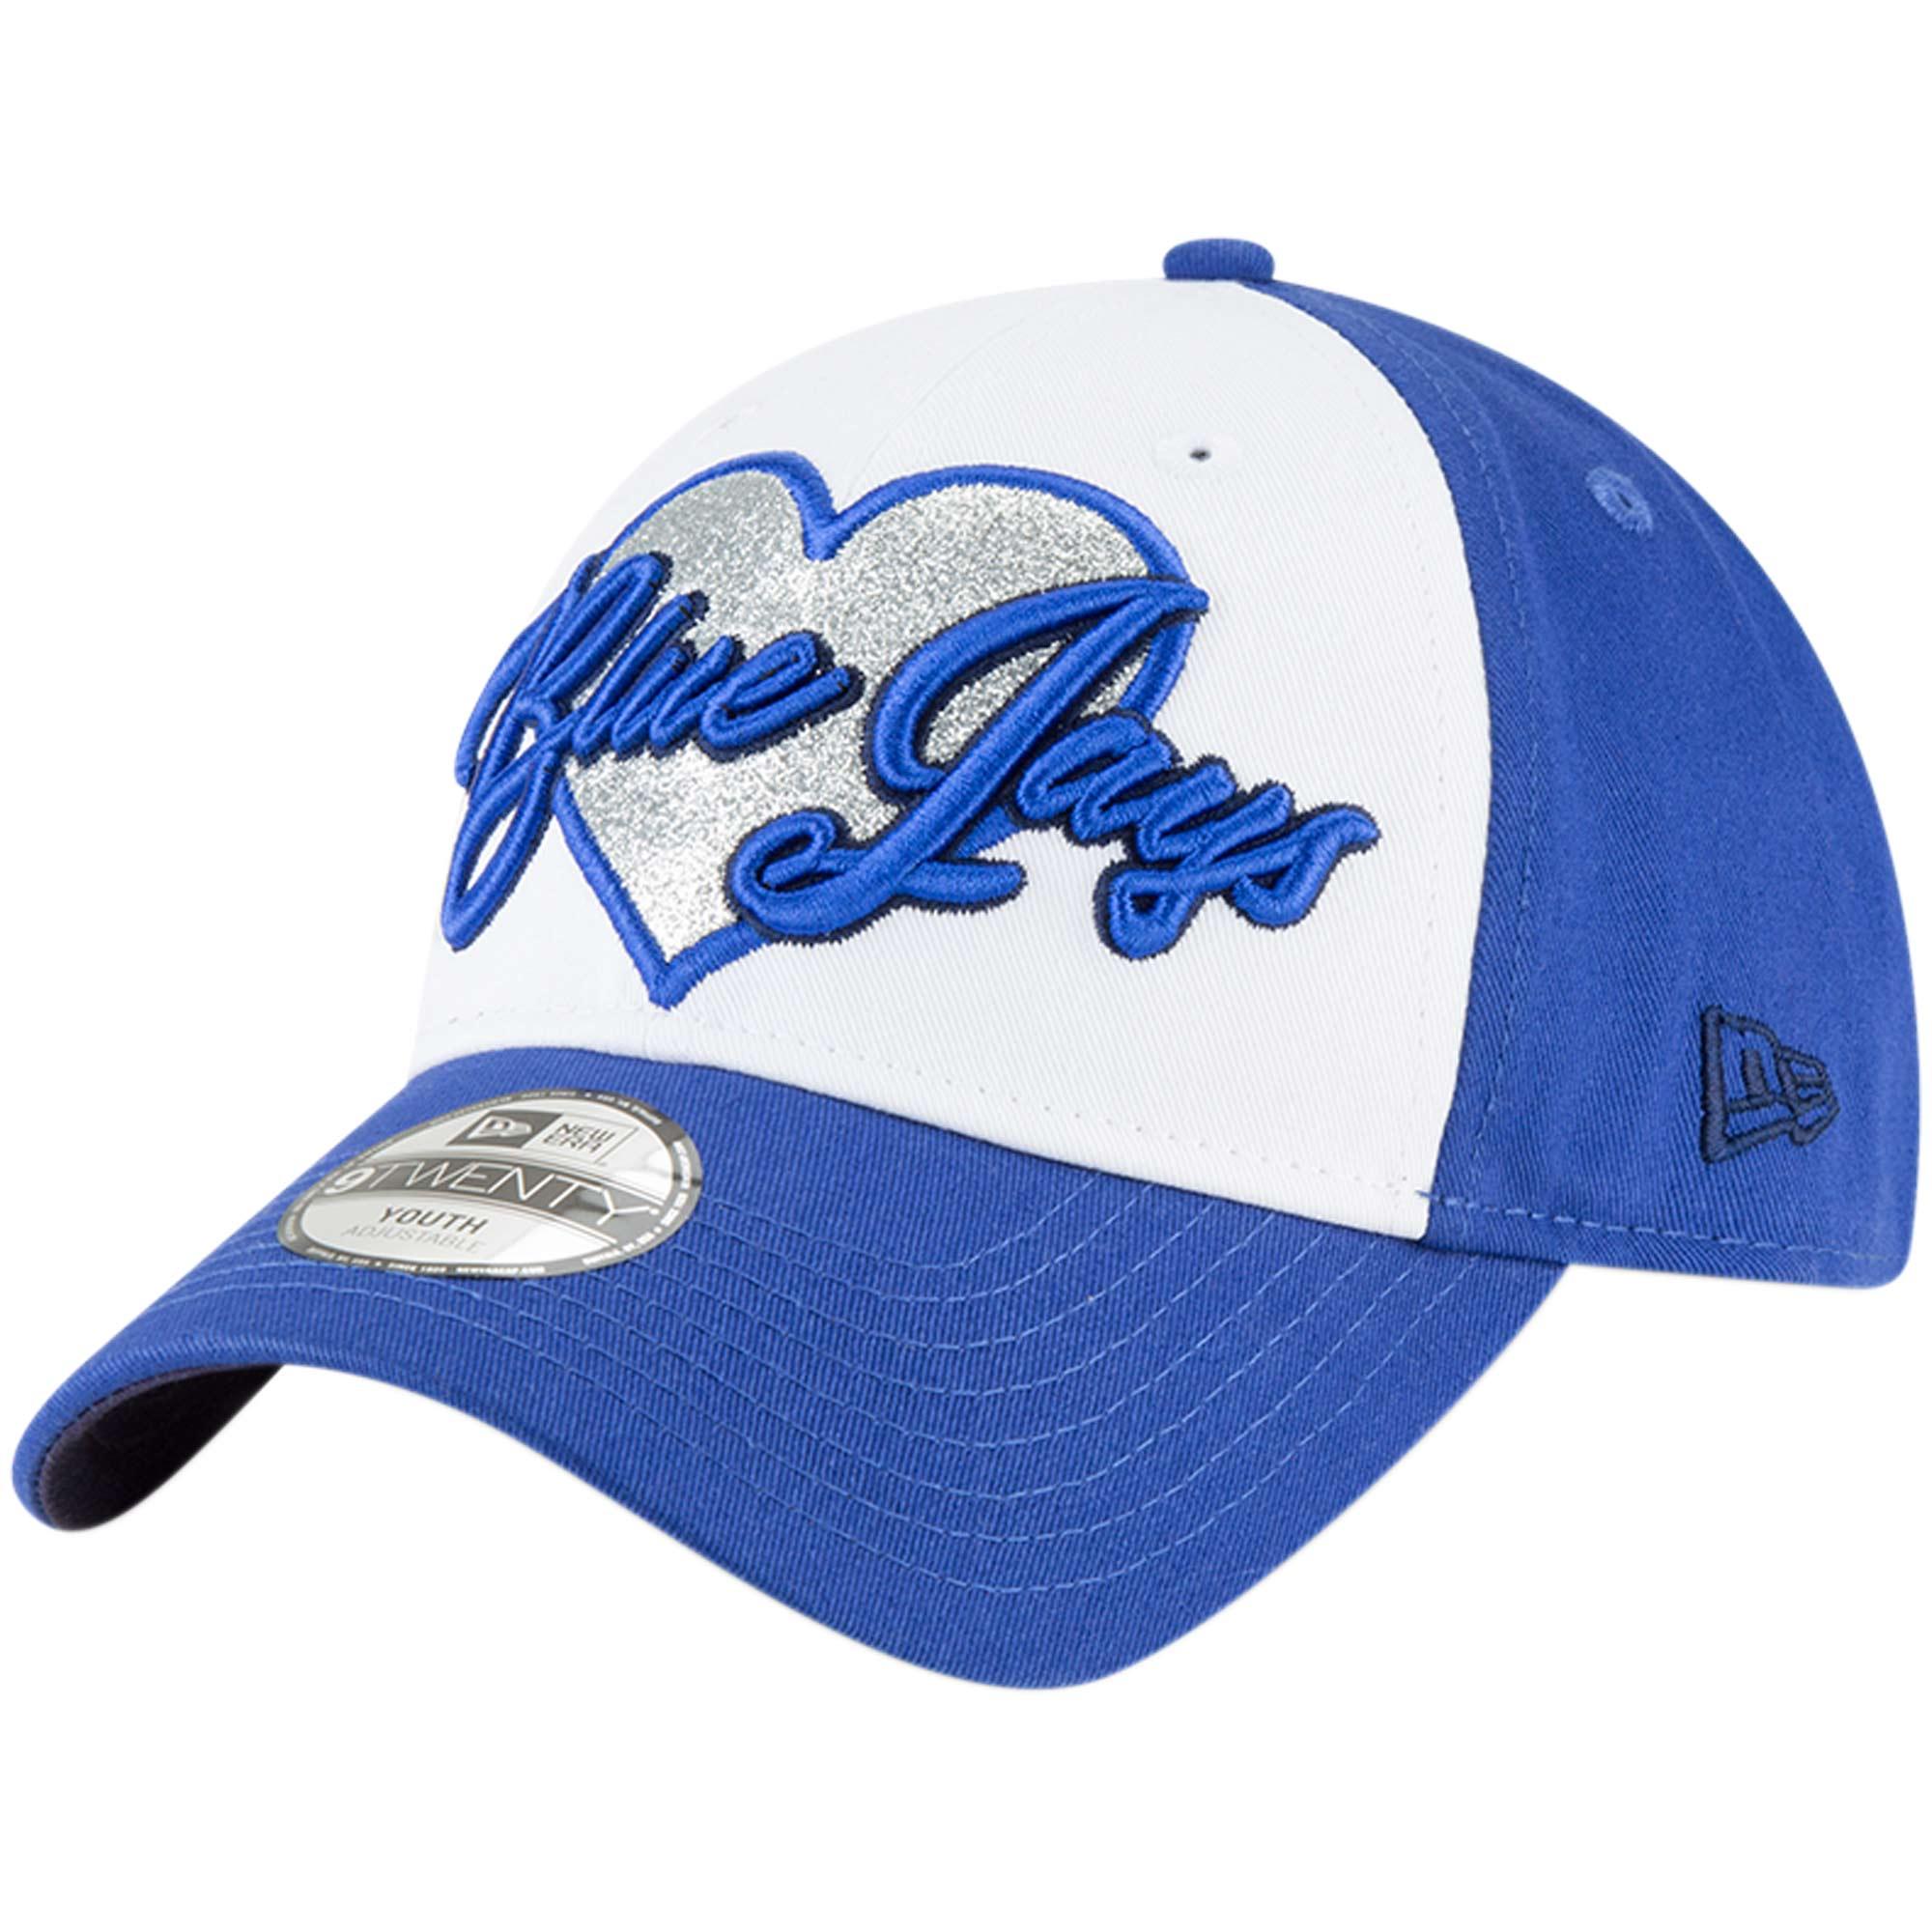 Toronto Blue Jays New Era Girls Youth Sparkly Fan 9TWENTY Adjustable Hat - Royal - OSFA